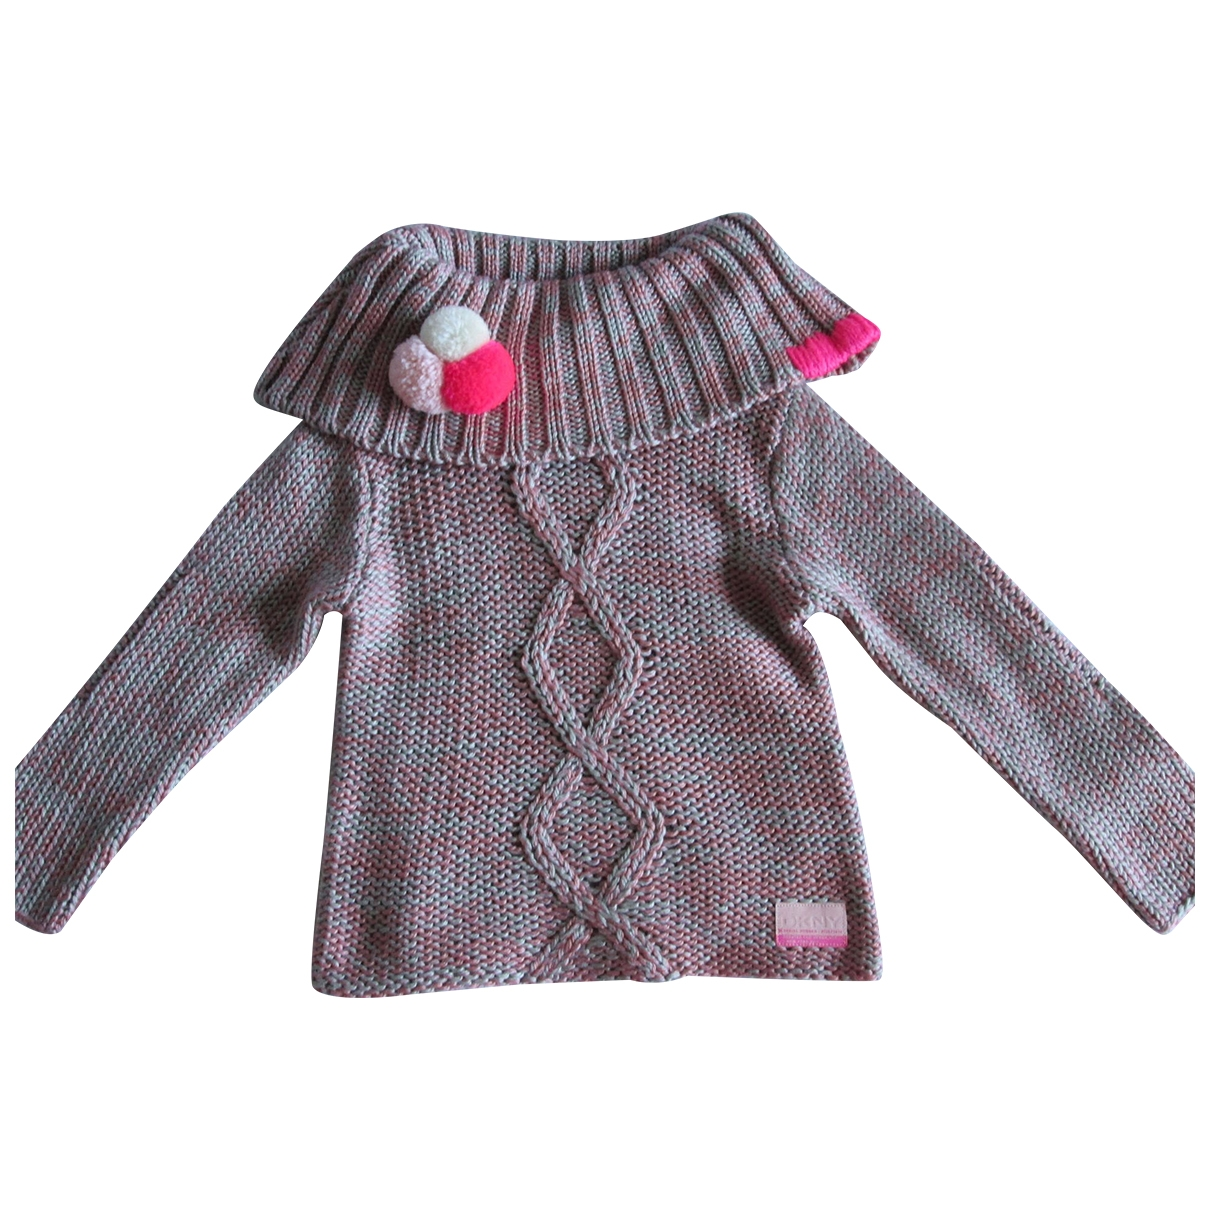 Dkny - Pull   pour enfant en laine - rose